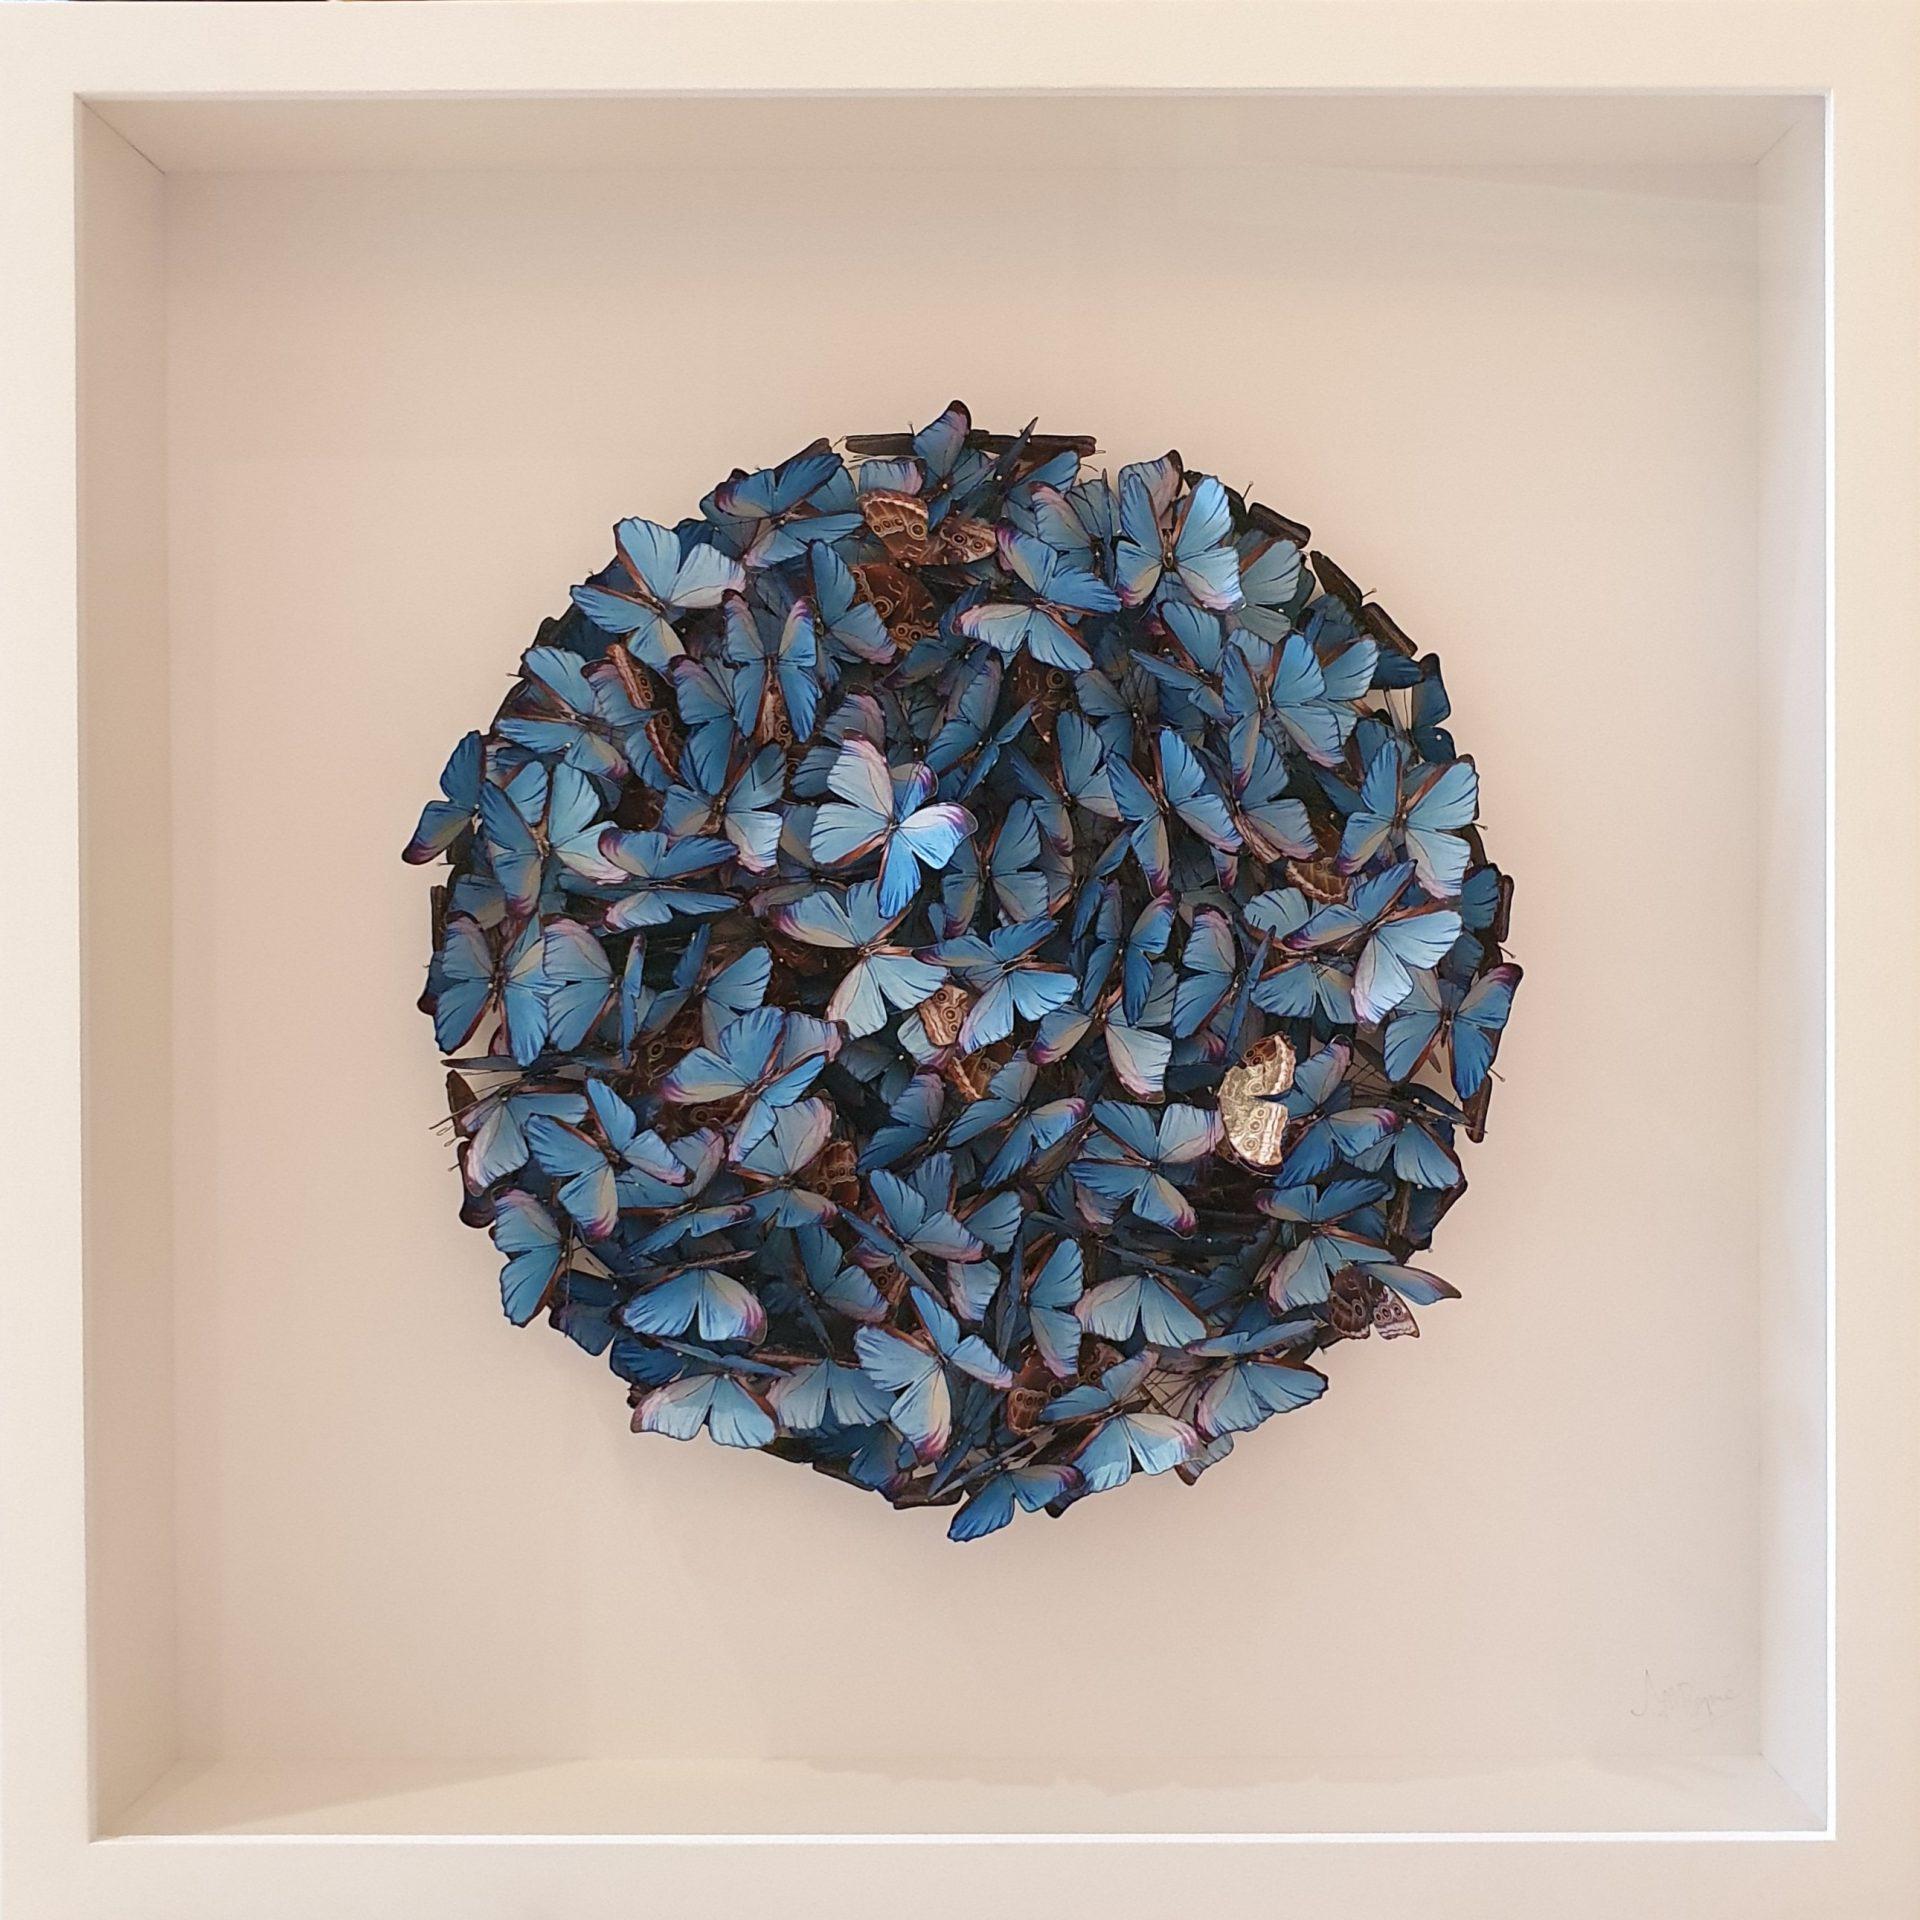 Daniel Byrne Blue Morpho Cluster 2 original butterfly wall art for sale